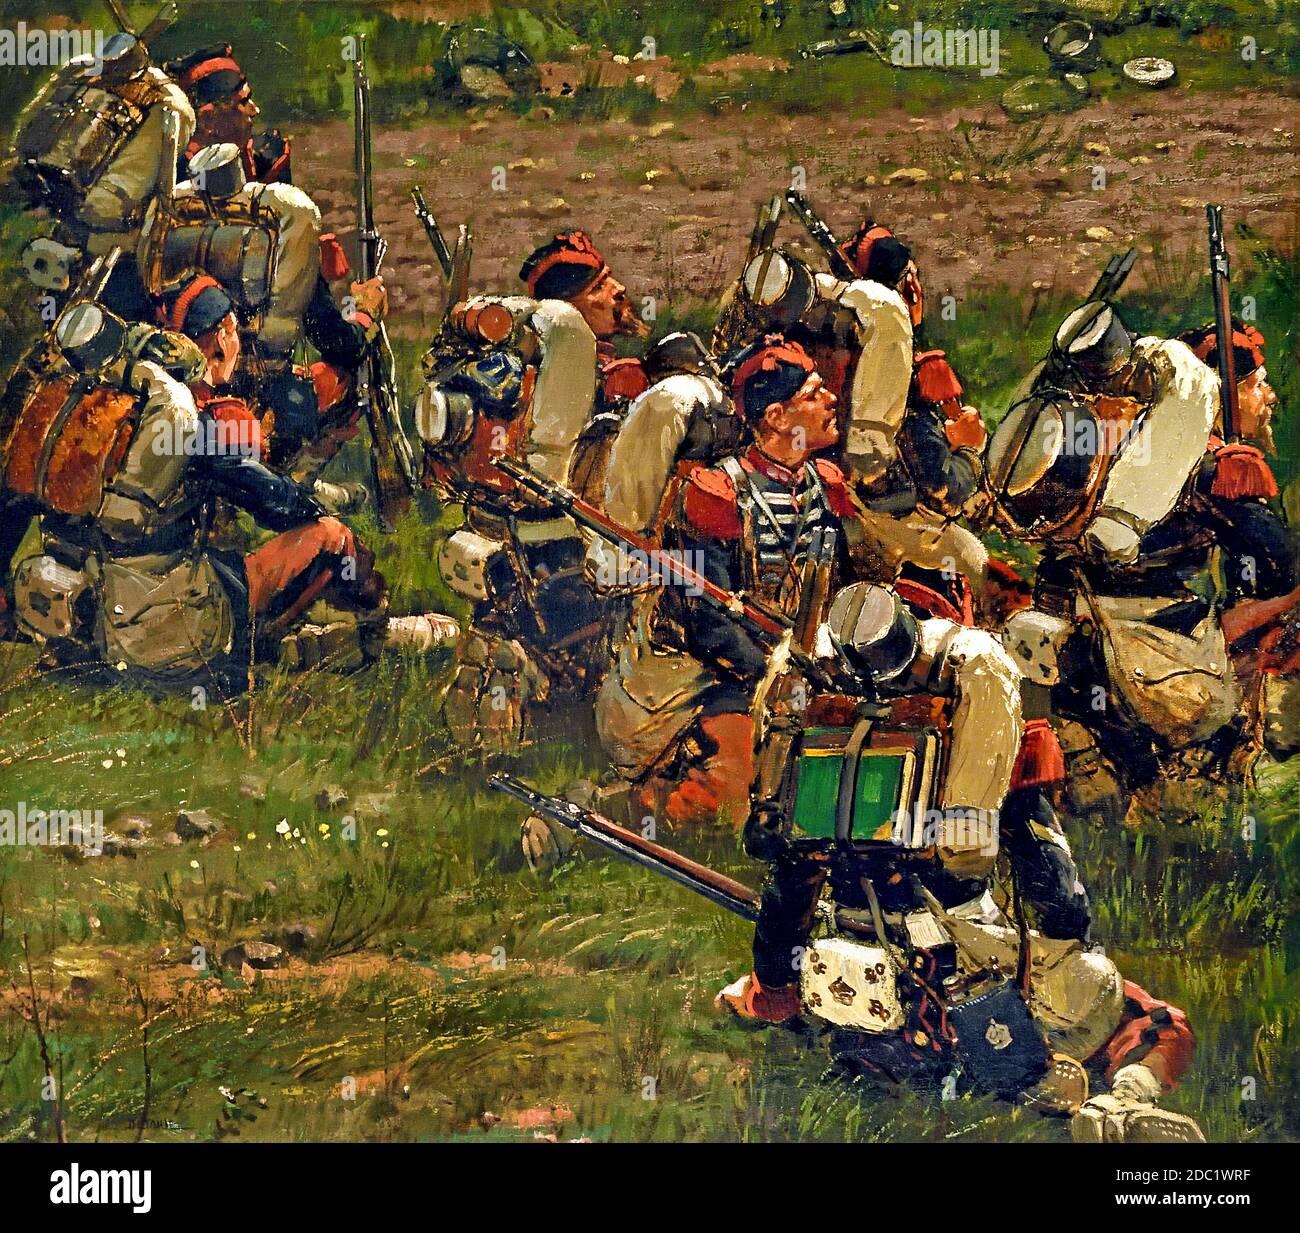 Grenardier destacamento de la Garde imperiale por Jean-Baptiste Édouard Detaille, 1848 – 1912, Alphonse de Neuville, 1835-1885, Francia, francés, alemán, Alemania, ( Batalla de Rezonville agosto de 1870 ) Foto de stock